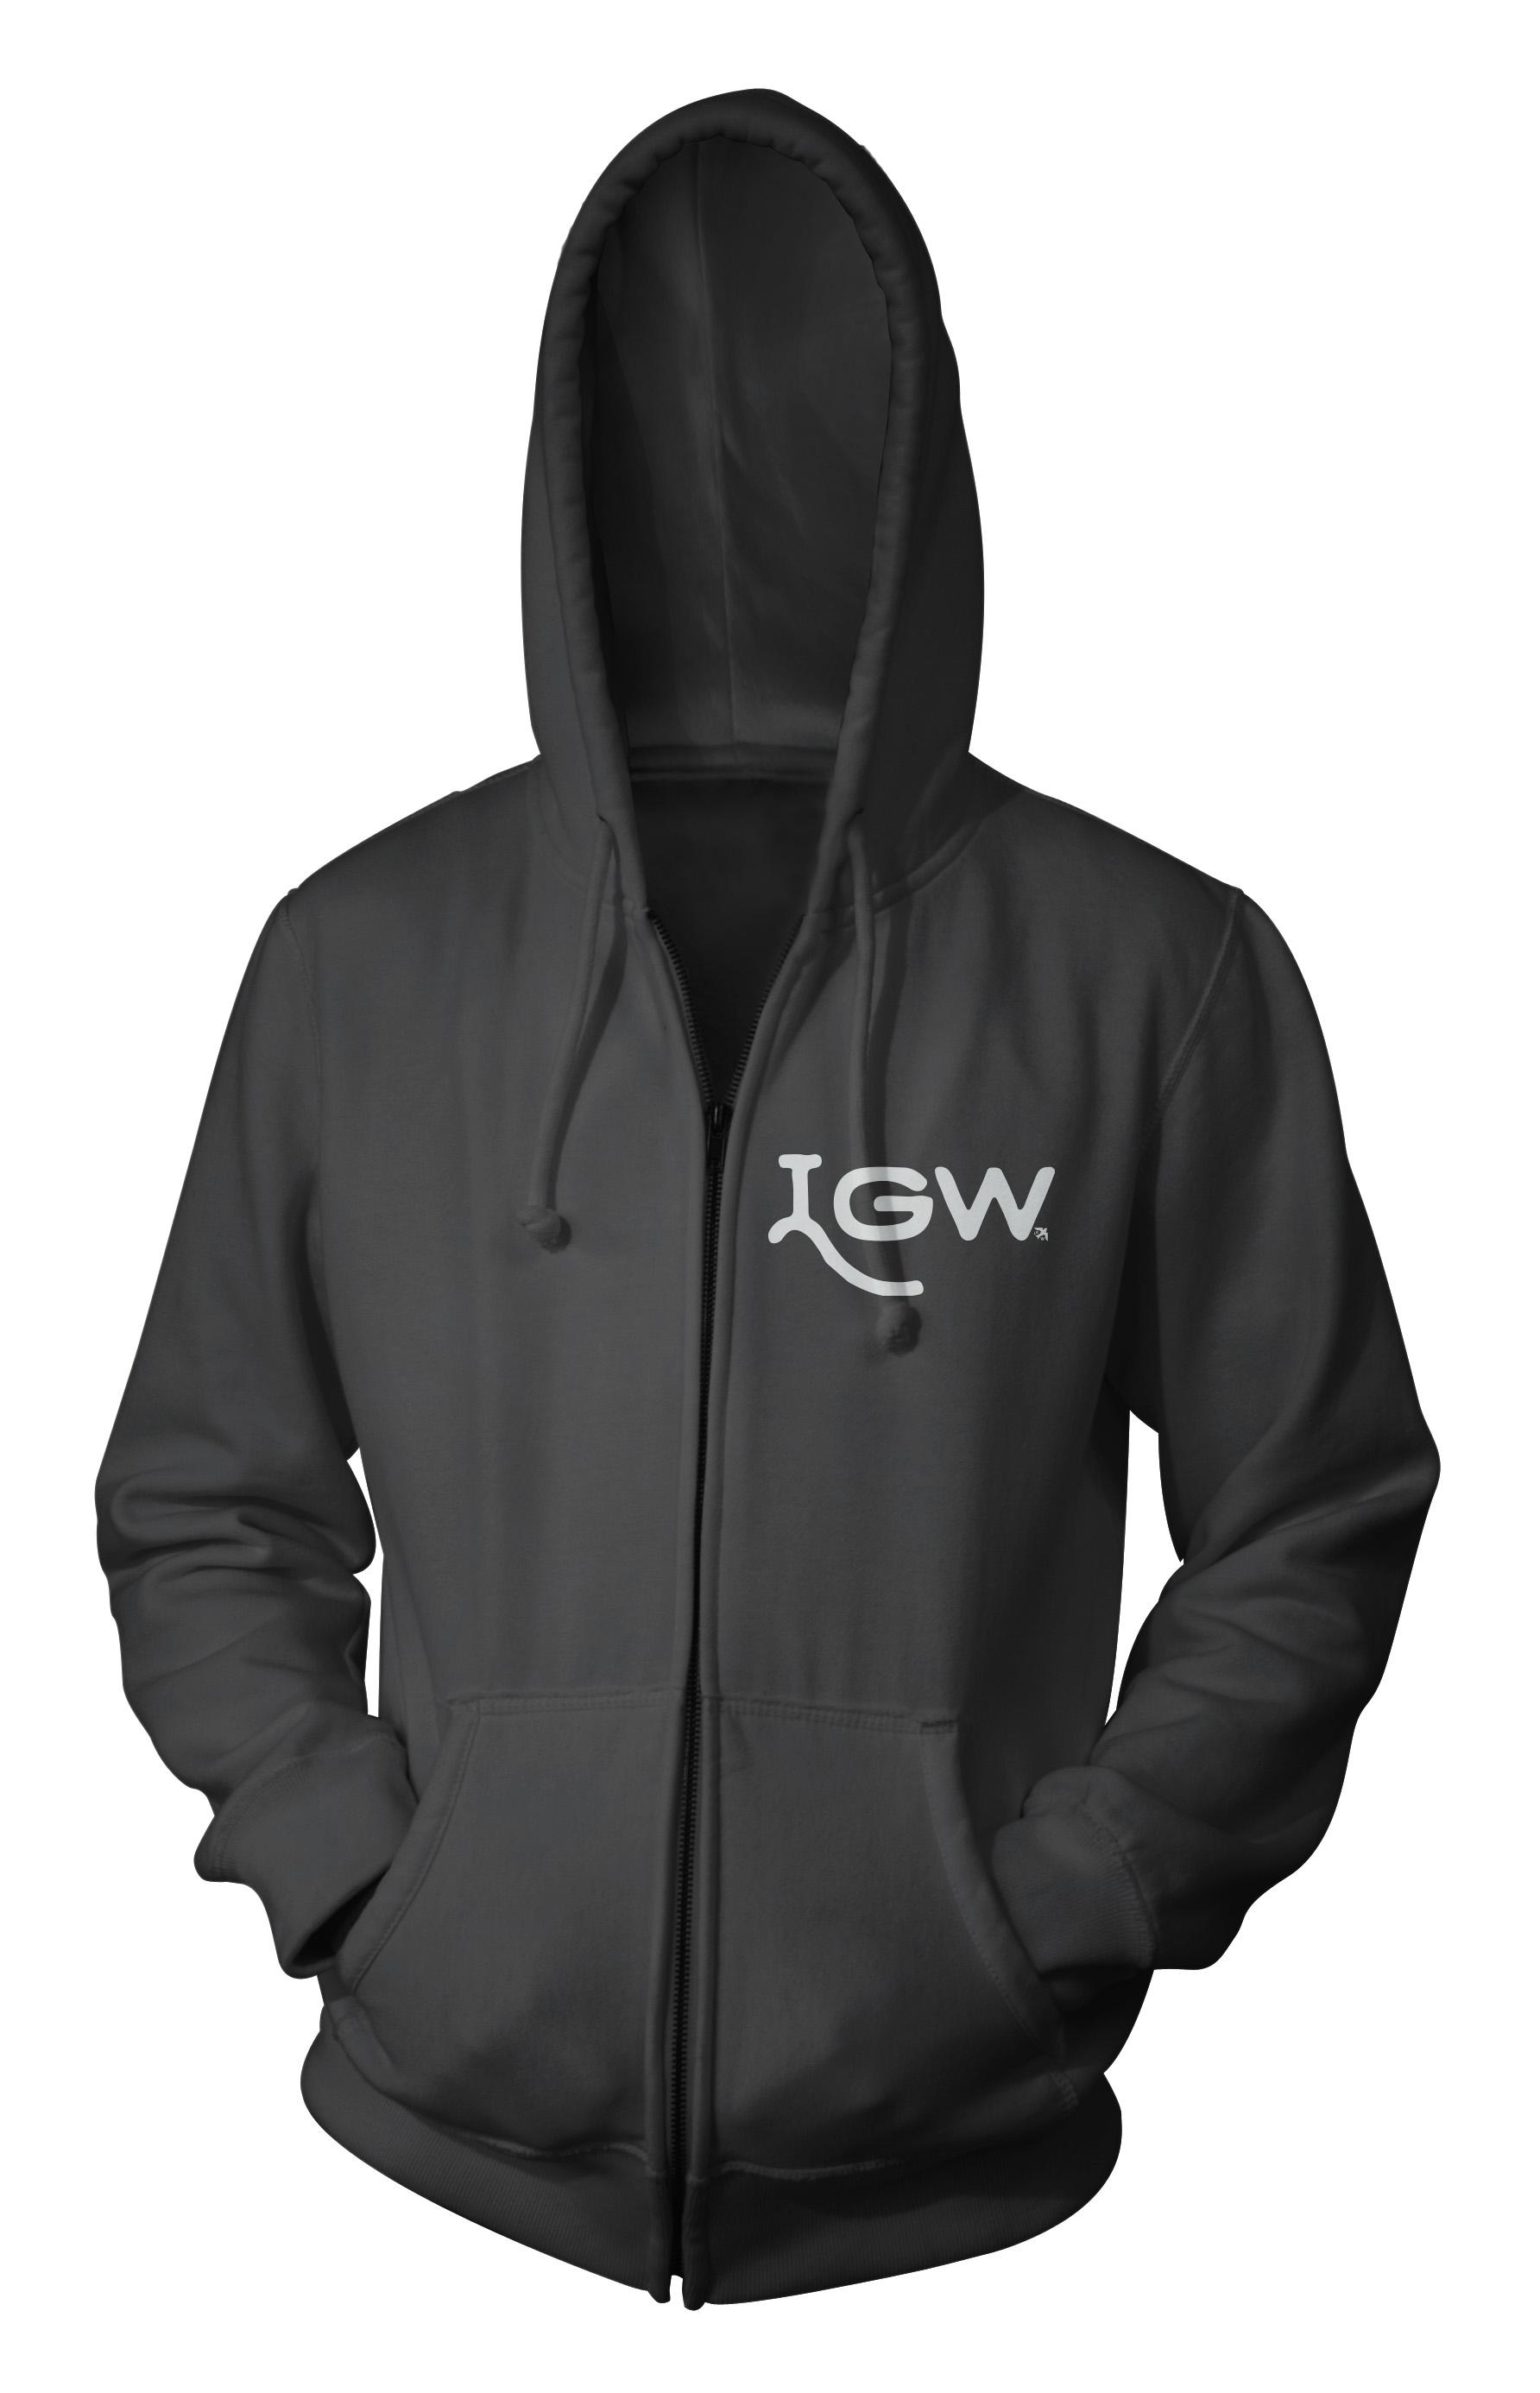 LGW-Made in HB-hoodie-front.jpg